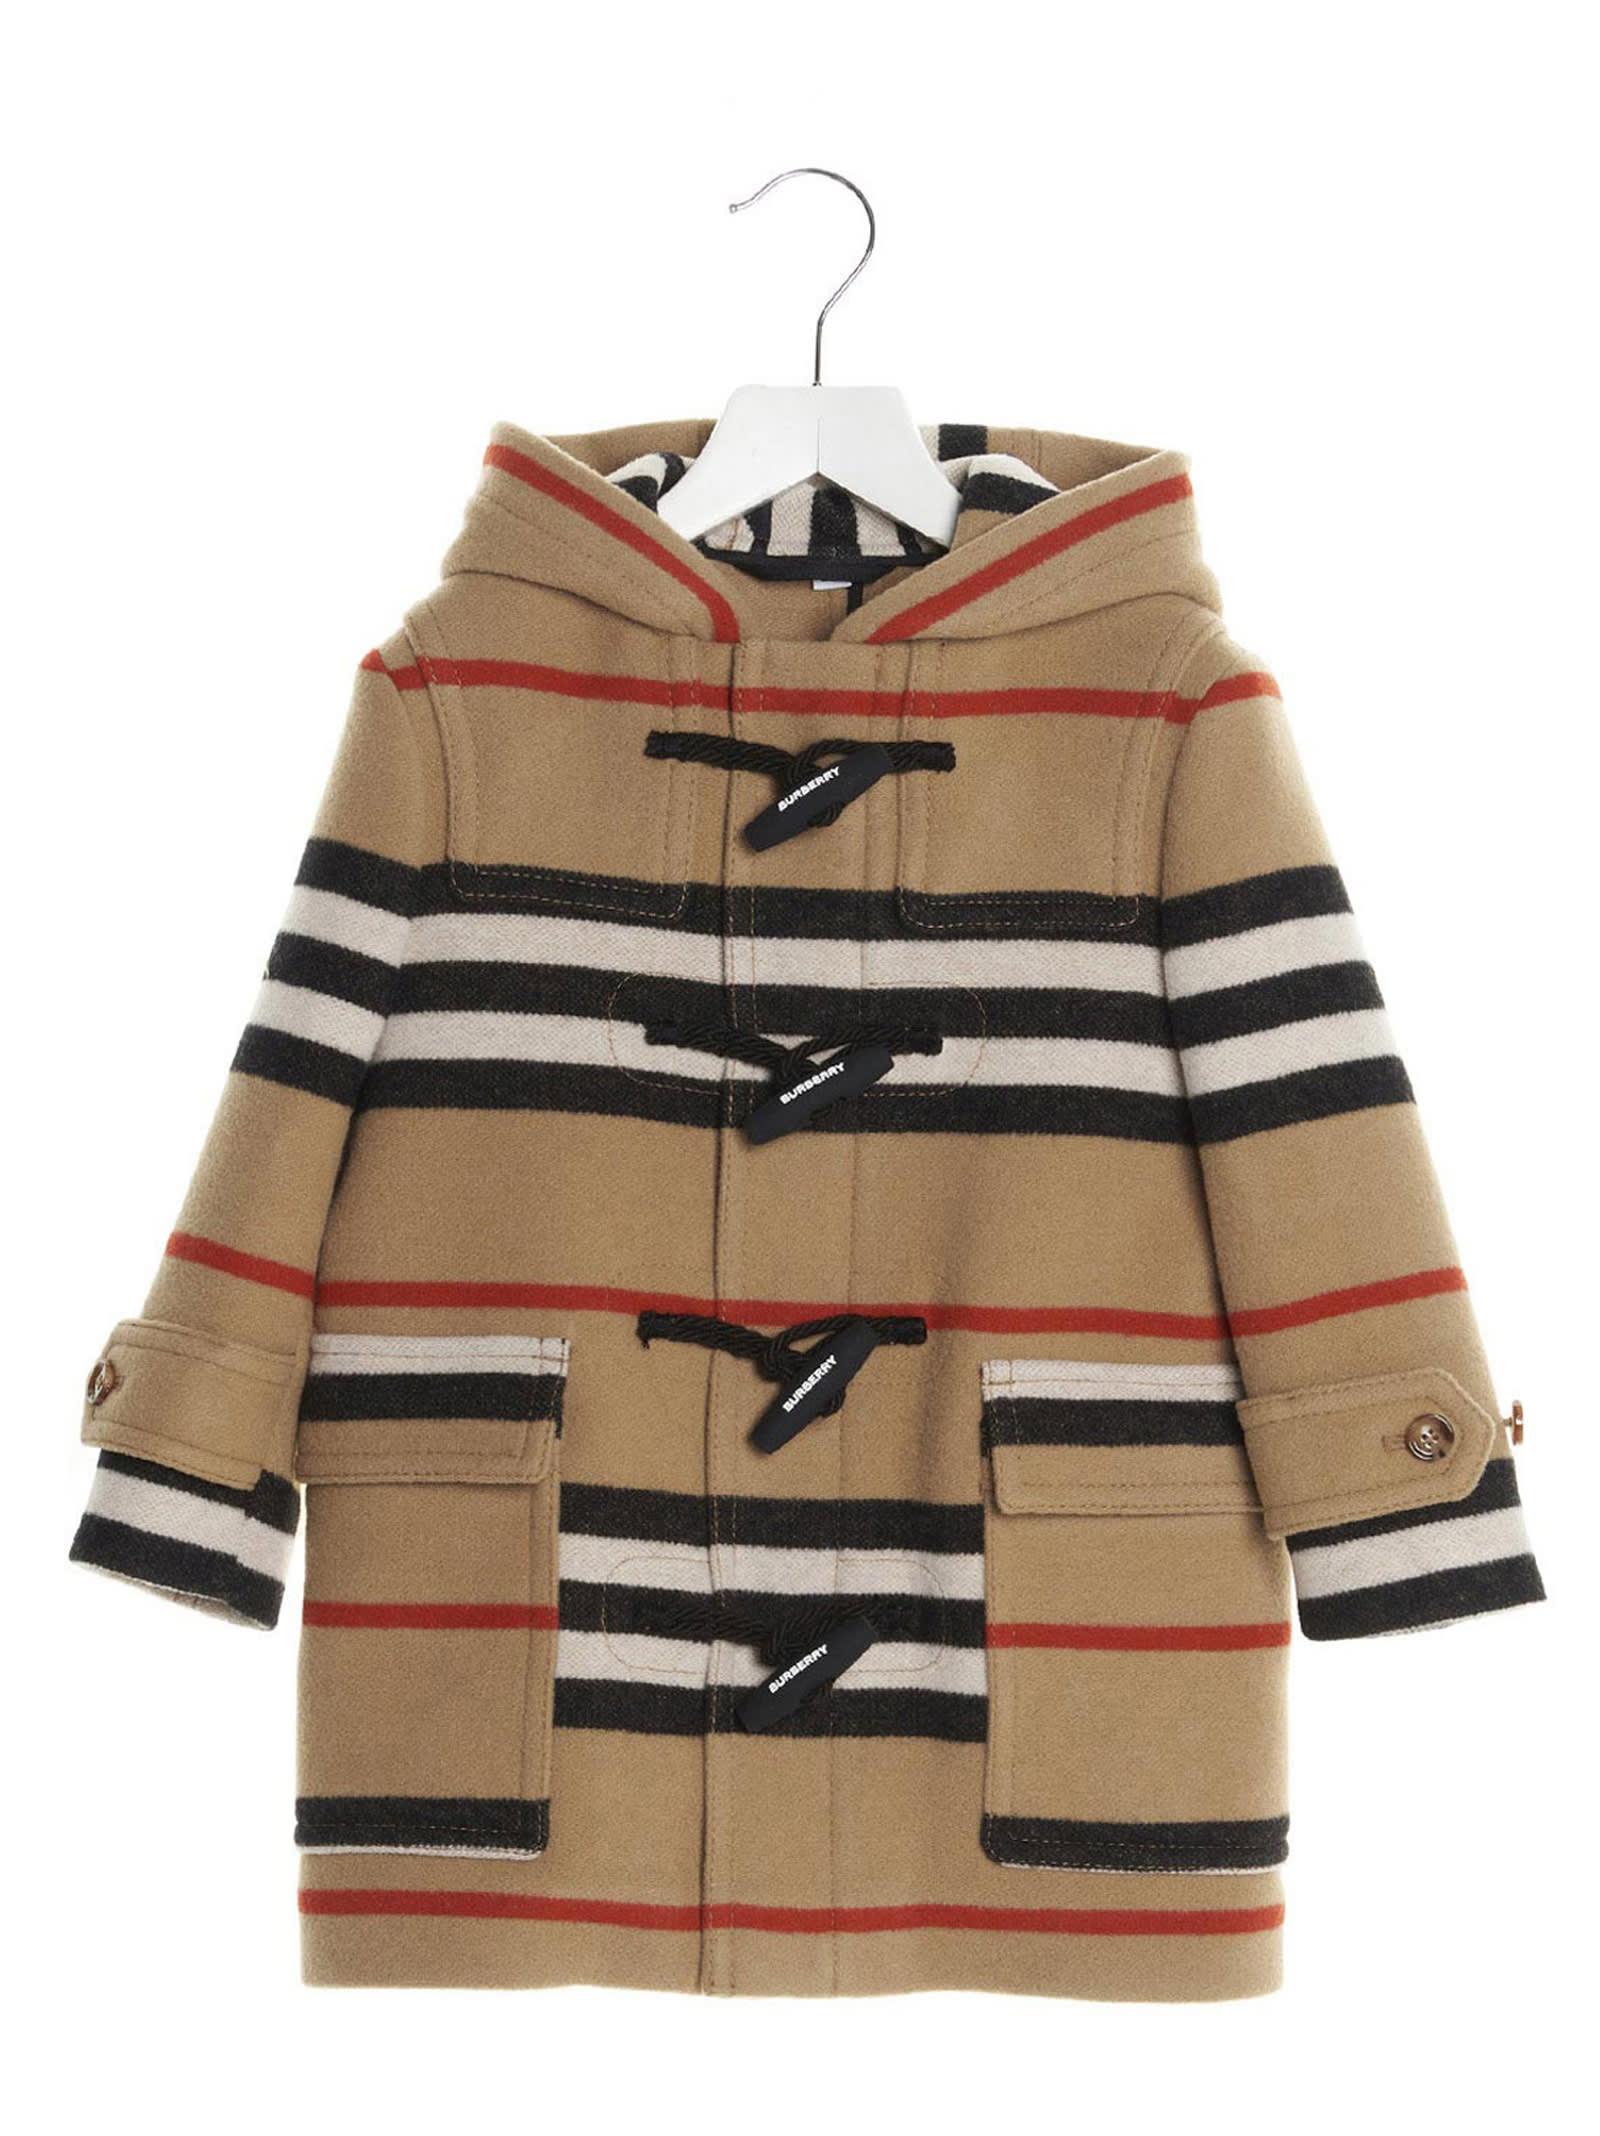 Burberry allistar Icon Jacket